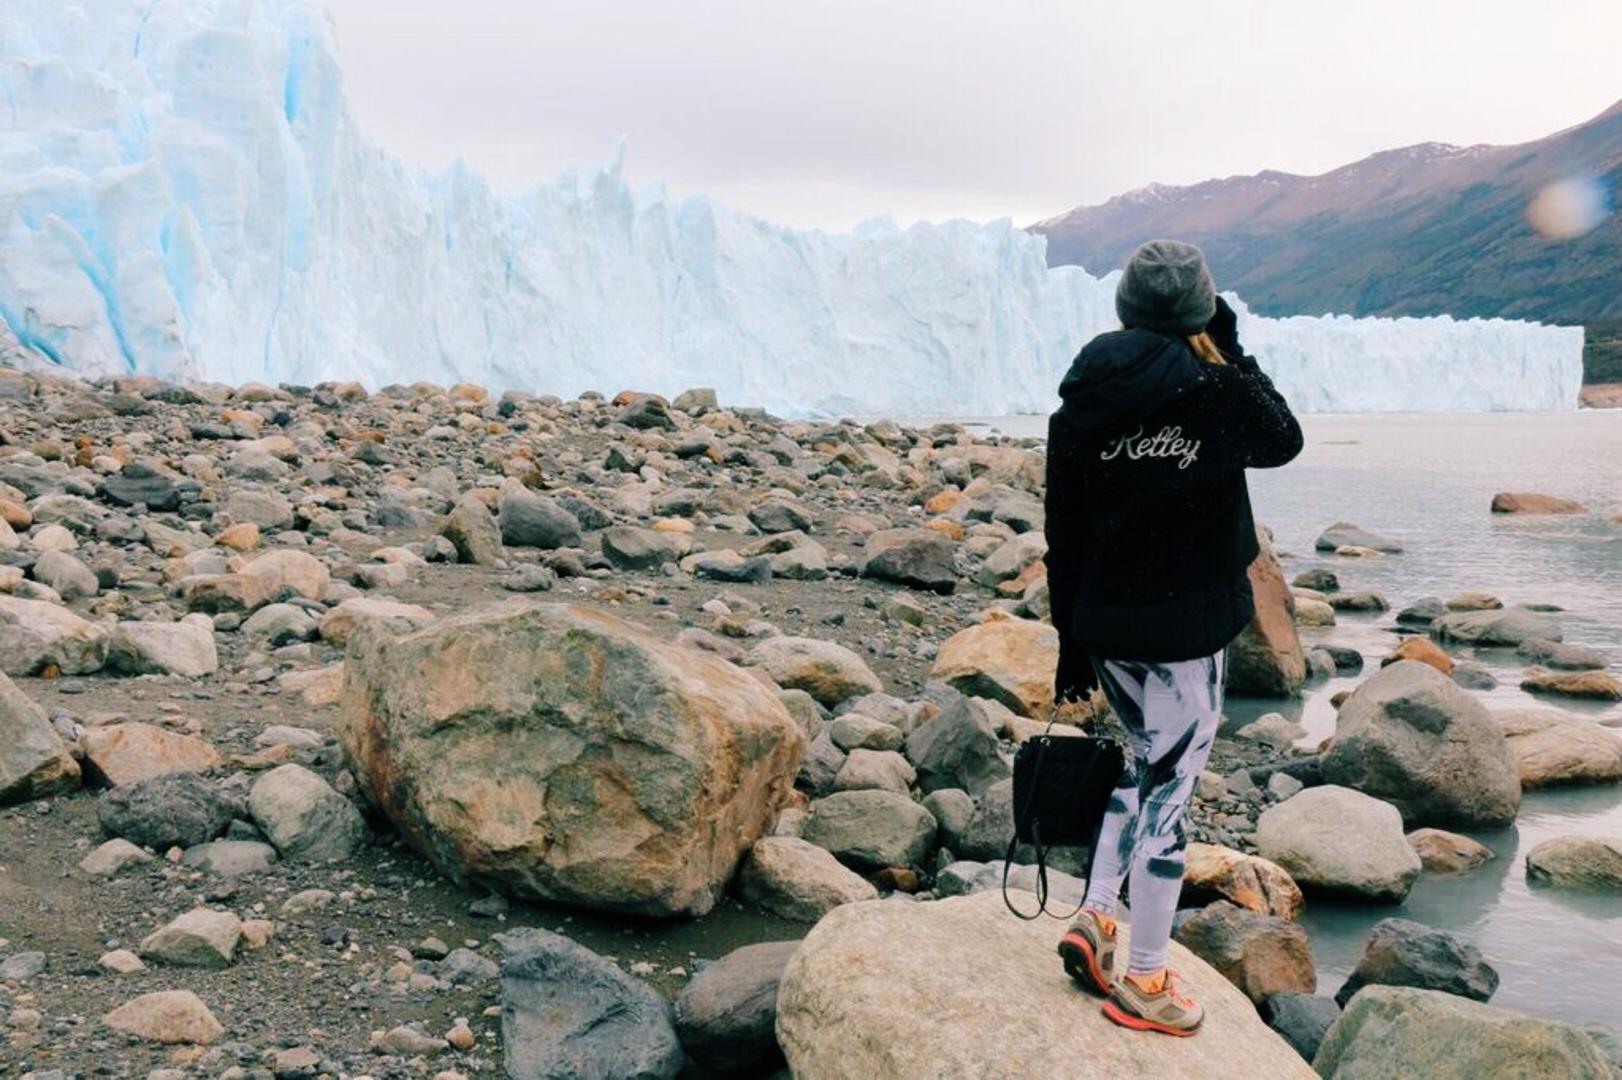 fashion, patagonia, south america, hike, leggings, yoga, adventure, nature, beauty, mountains, winter, vacation,  blogger, fashion blogger, tourism, travel, travelwriter, passportready, travel blogger, wanderlust, ilovetravel, write to travel, travel photography, beauty, tourist, solo travel, world captures, world places, traveler. travel deeper, wanderer, travel blog, visiting, travel pics, trip, travel the world, rag and bone, argentina, glacier, perito moreno